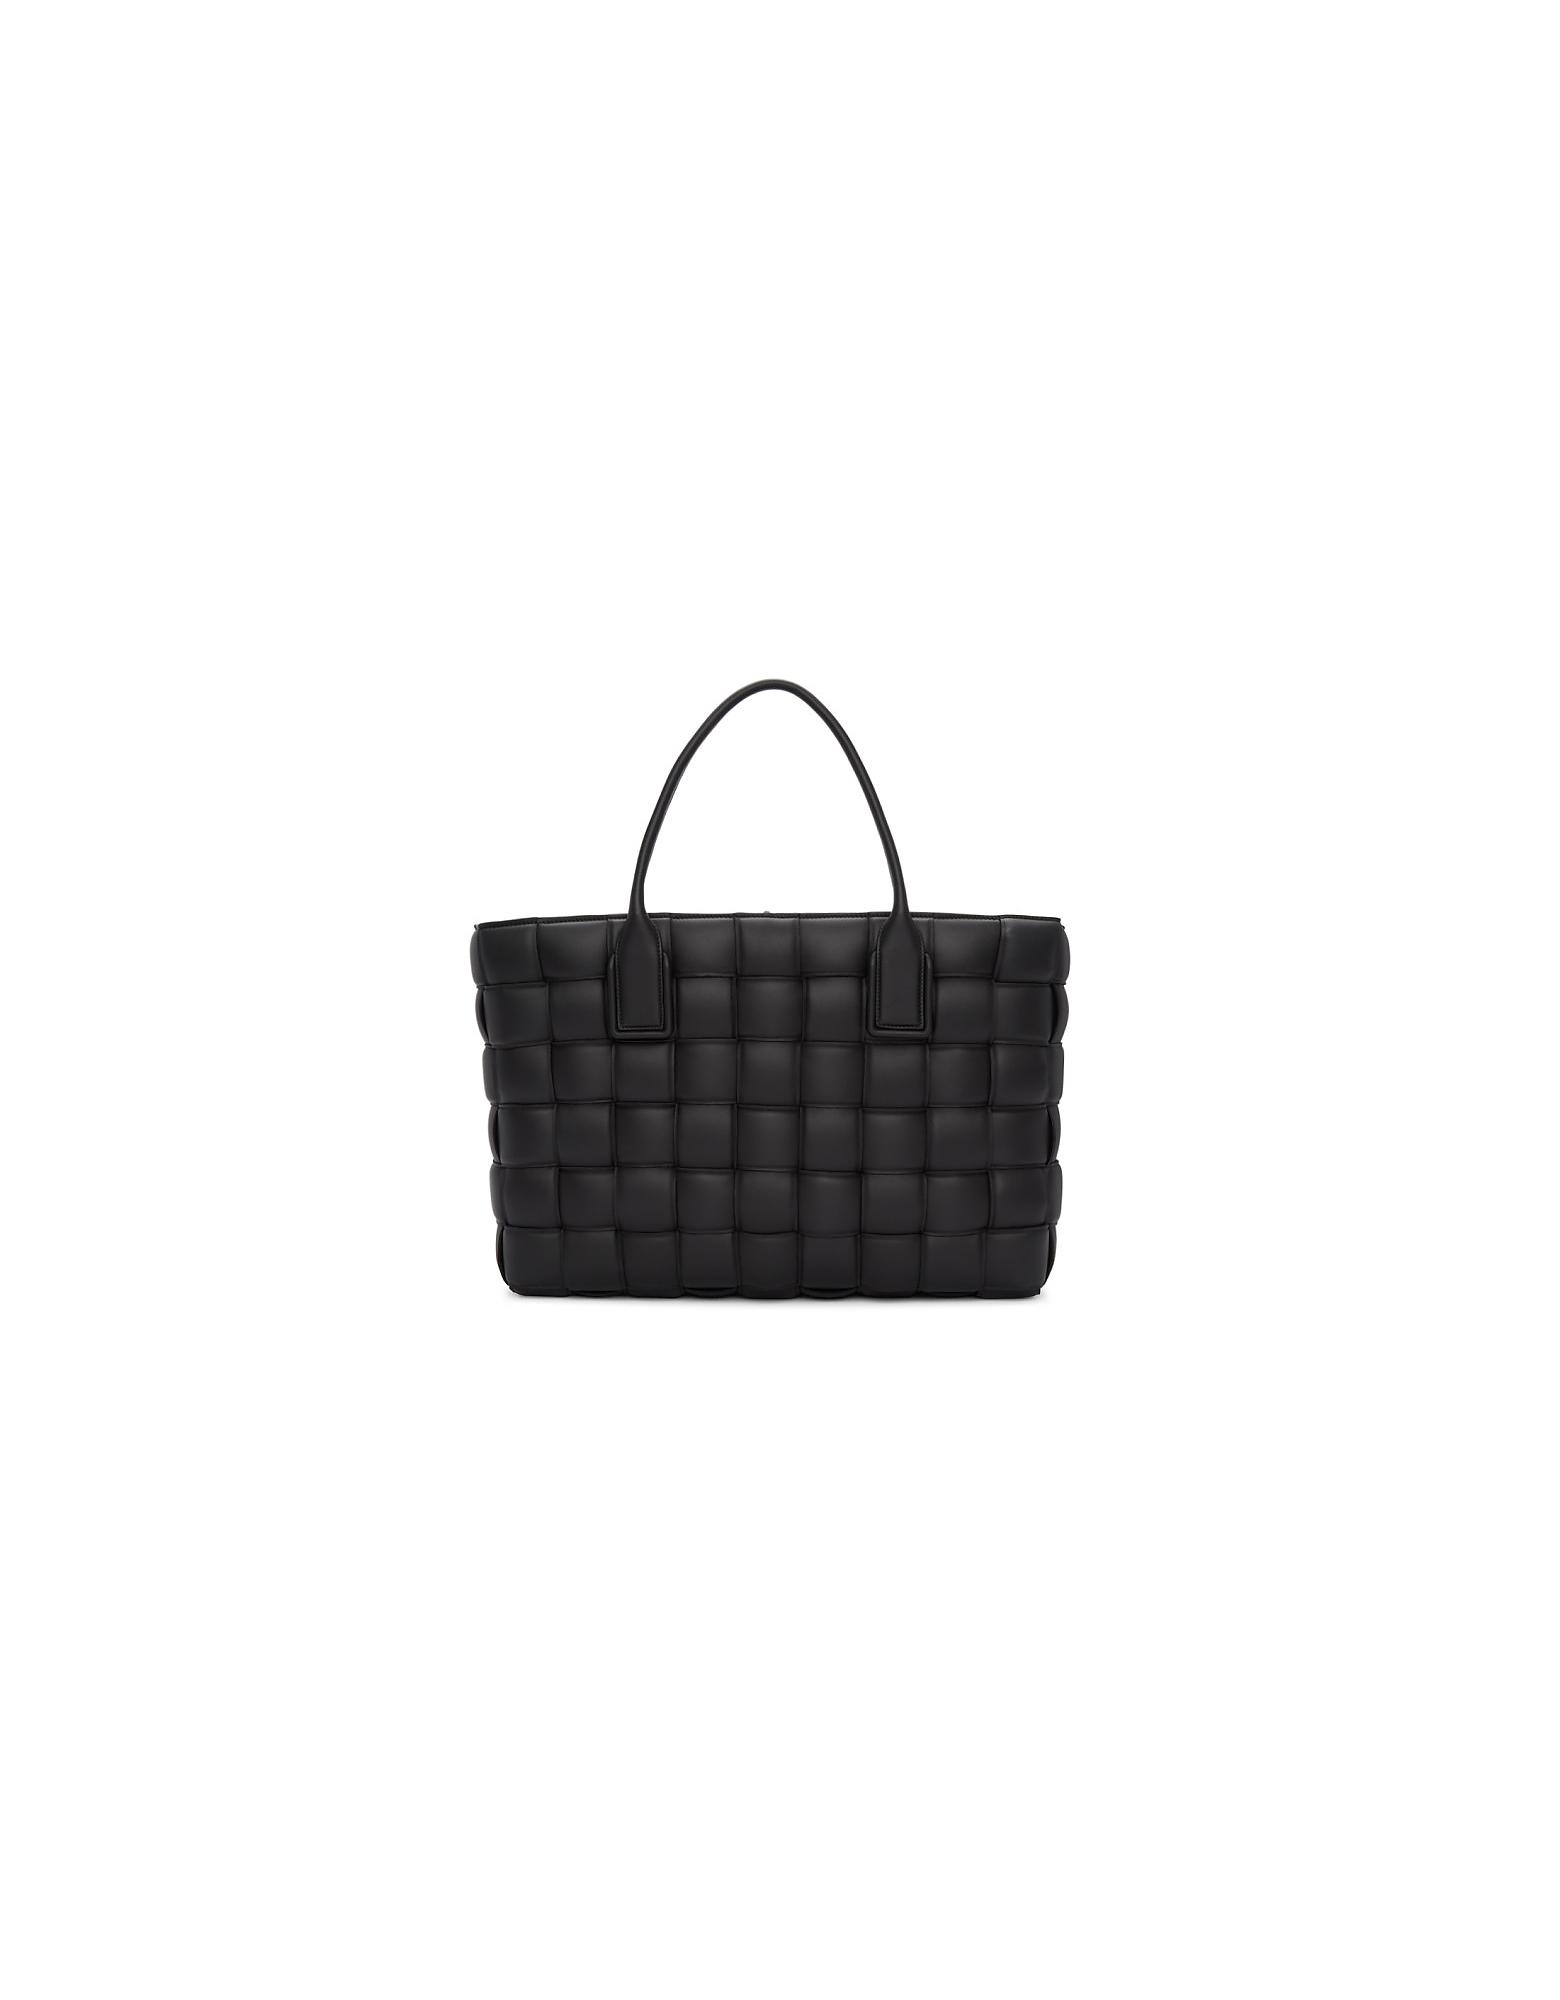 Bottega Veneta Designer Handbags, Black Large Maxi Intrecciato Tote